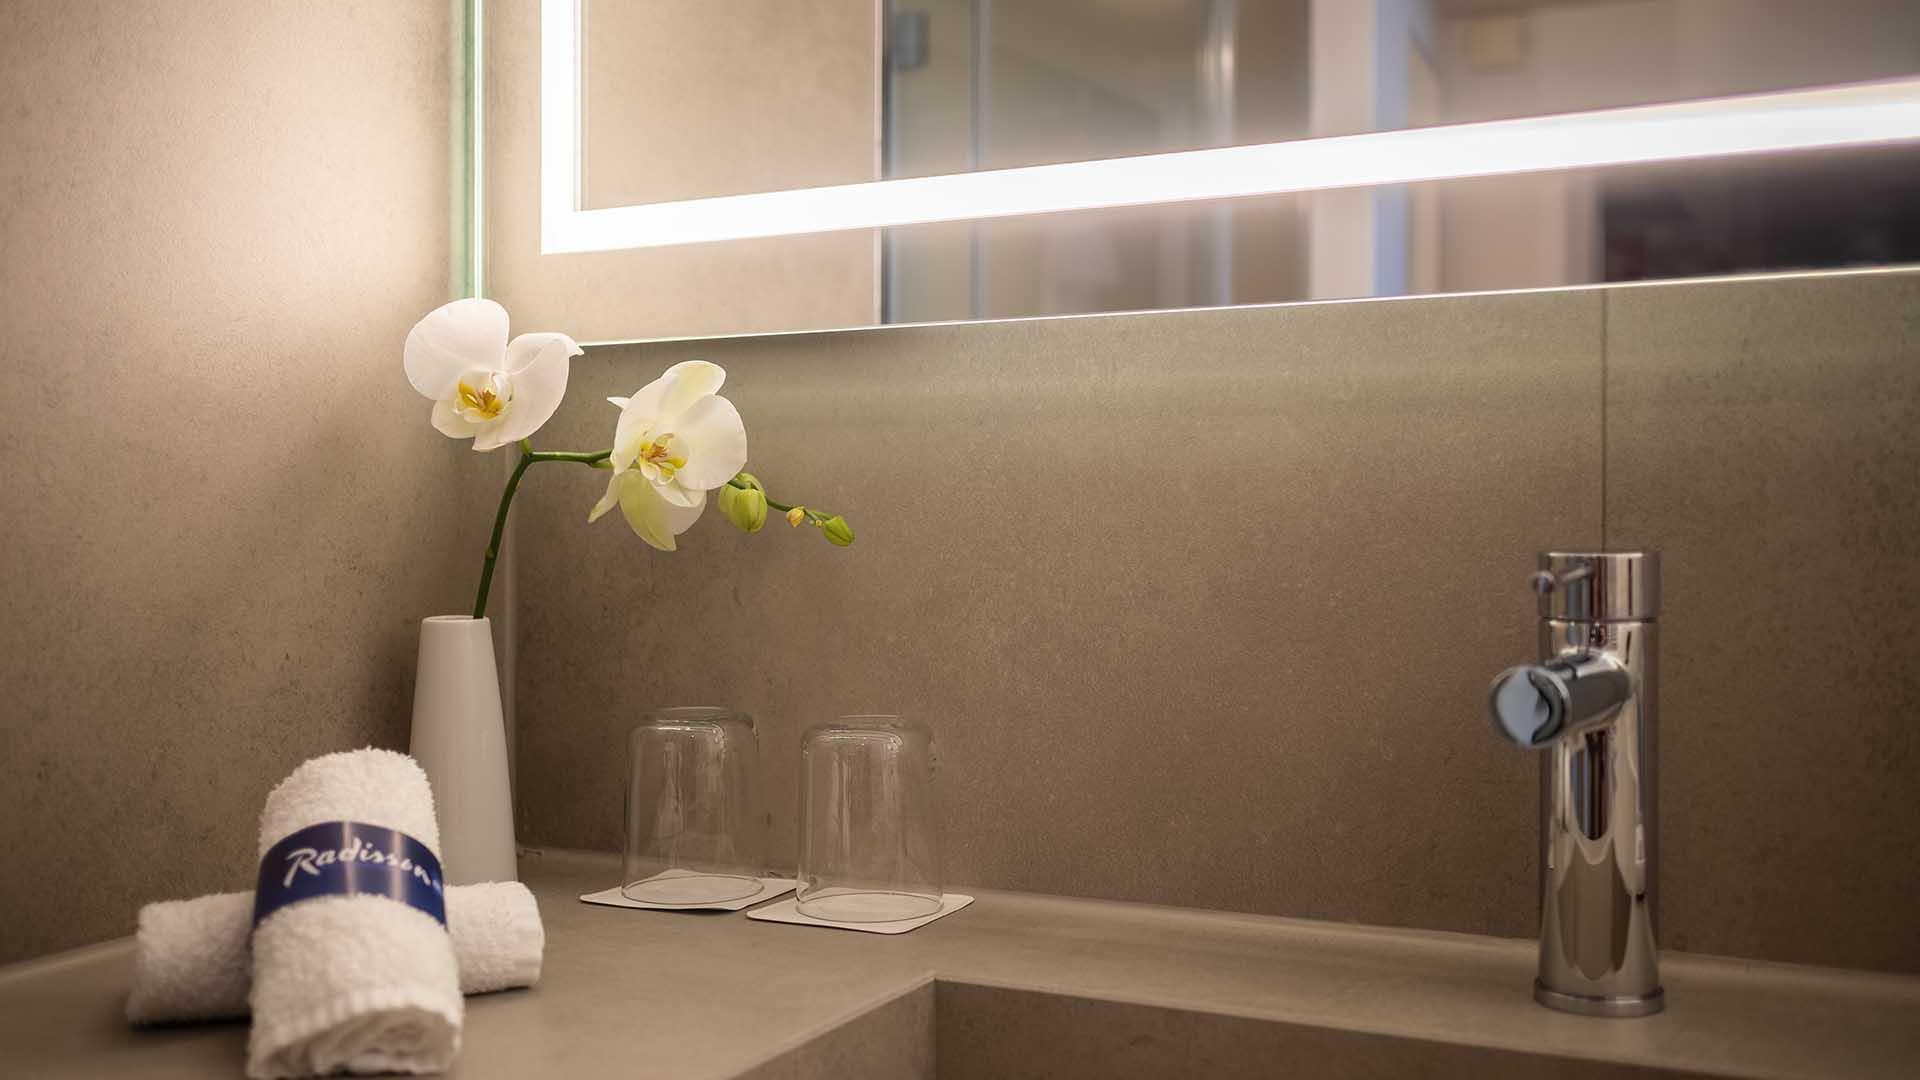 Radisson Blu Hotel Erfurt Premiumkategorie Detail Bad 1